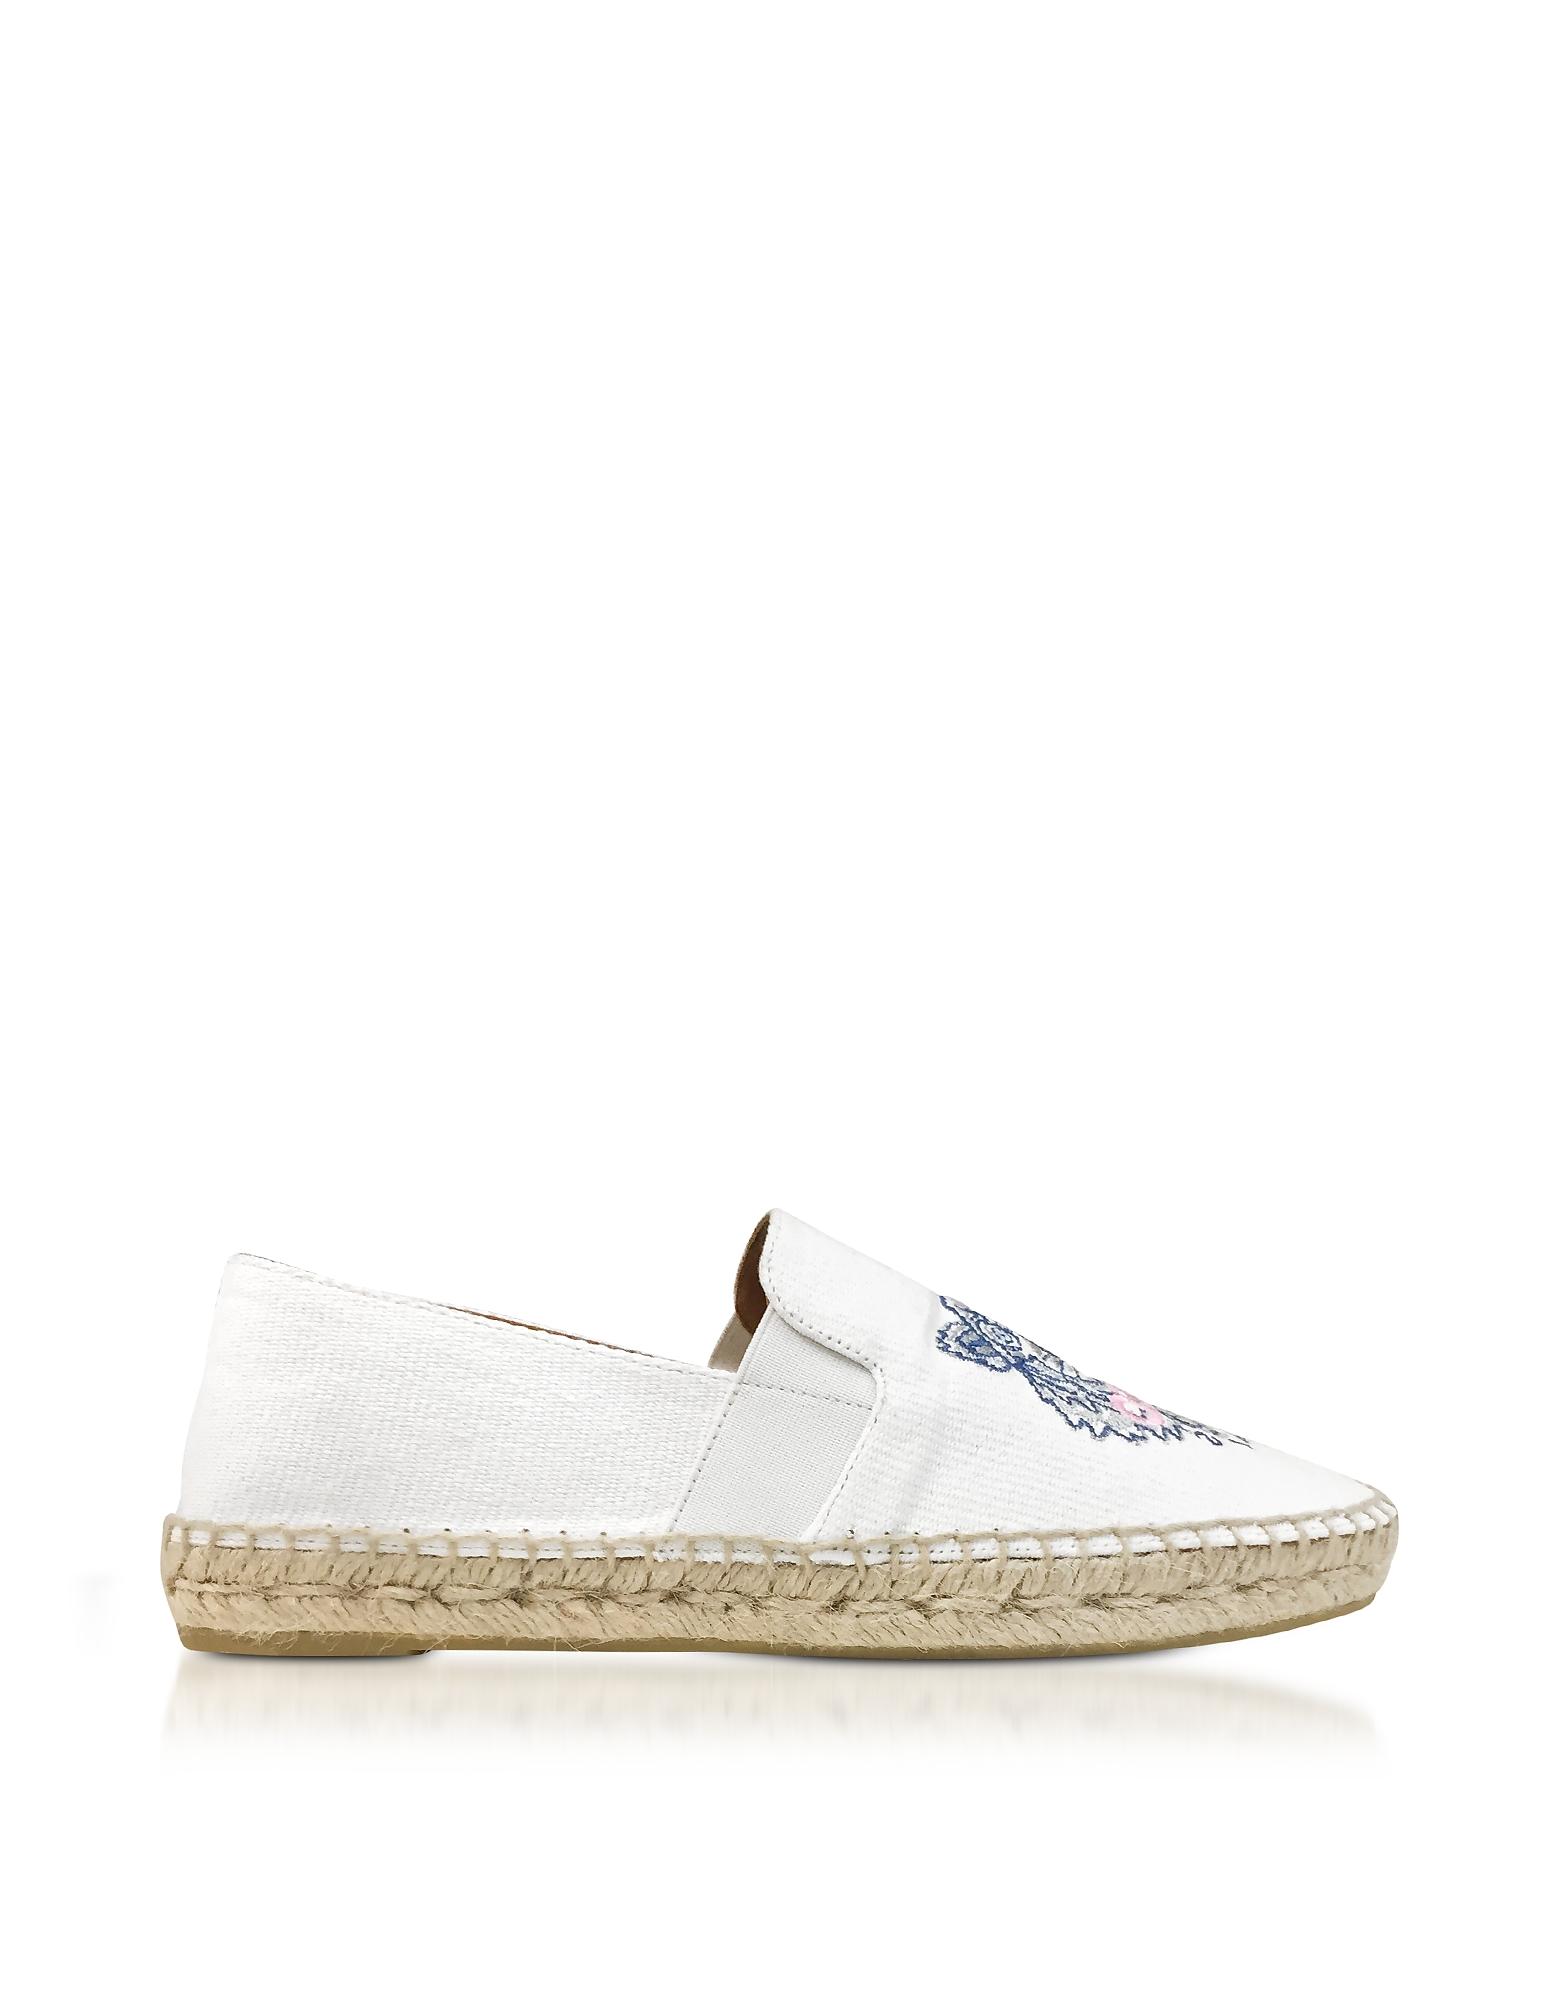 Kenzo Shoes, White Canvas Women's Tiger Espadrilles